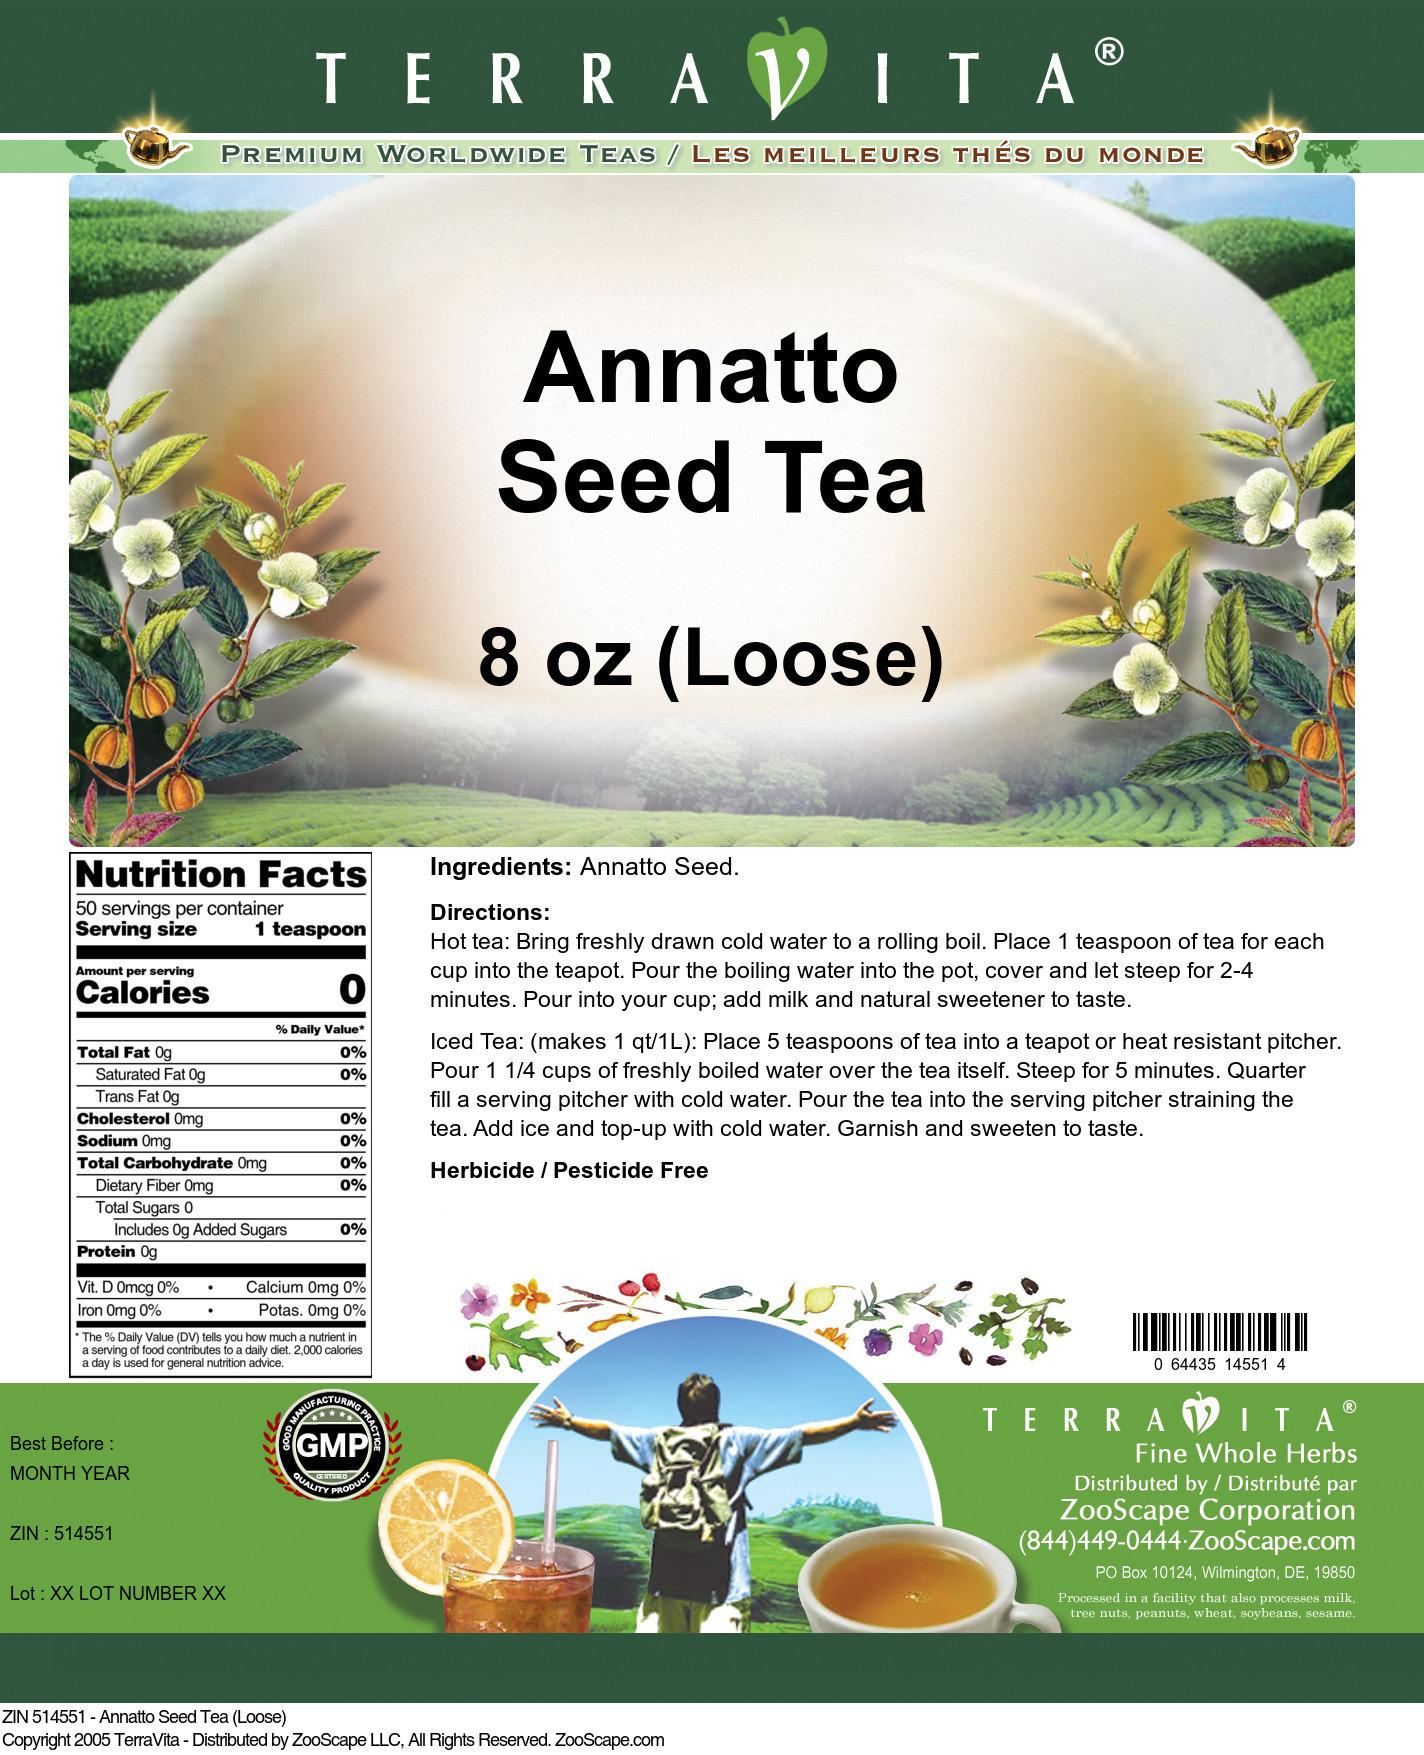 Annatto Seed